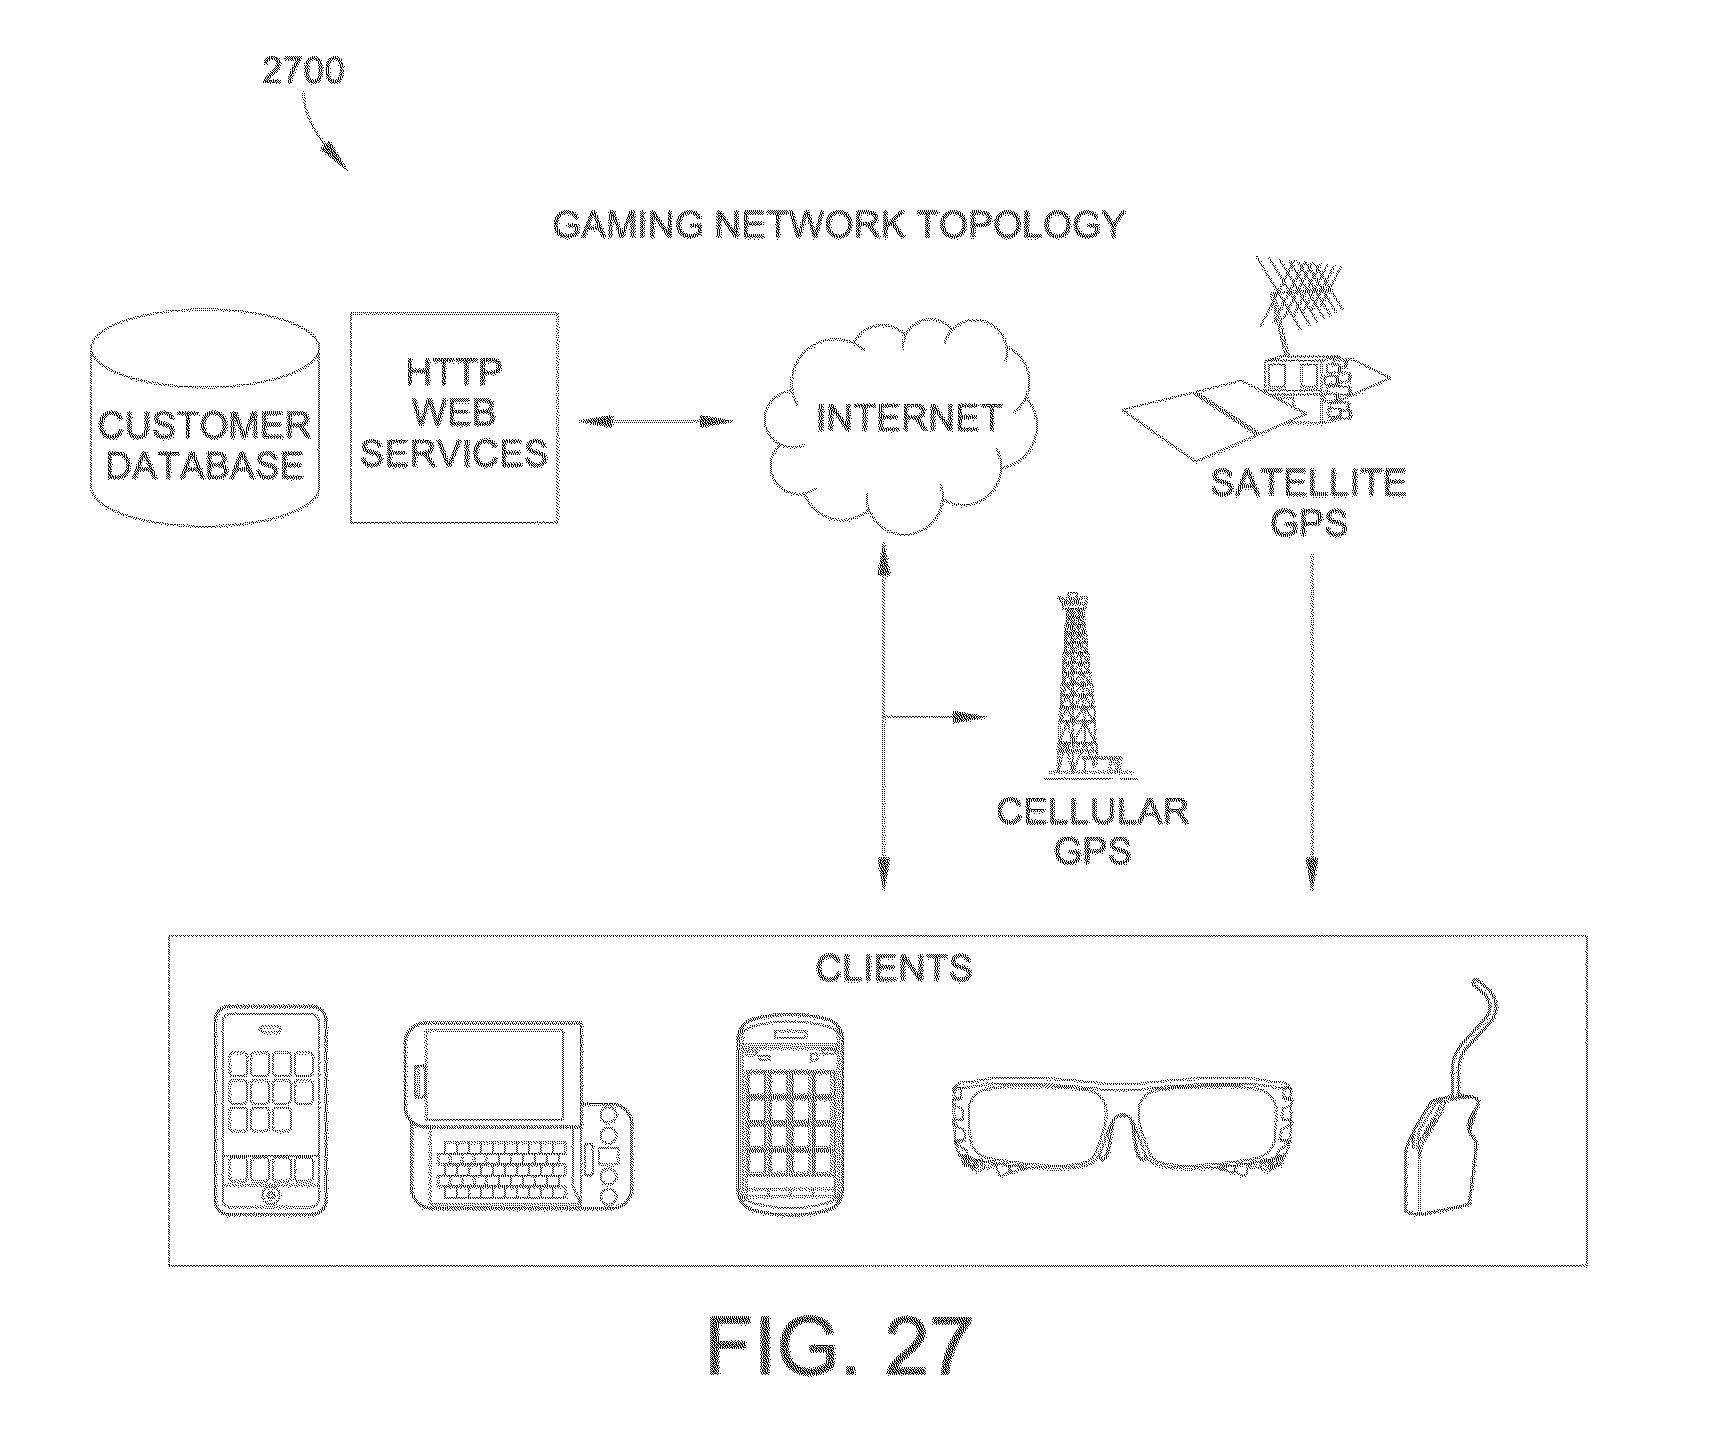 Patent US 9,097,890 B2